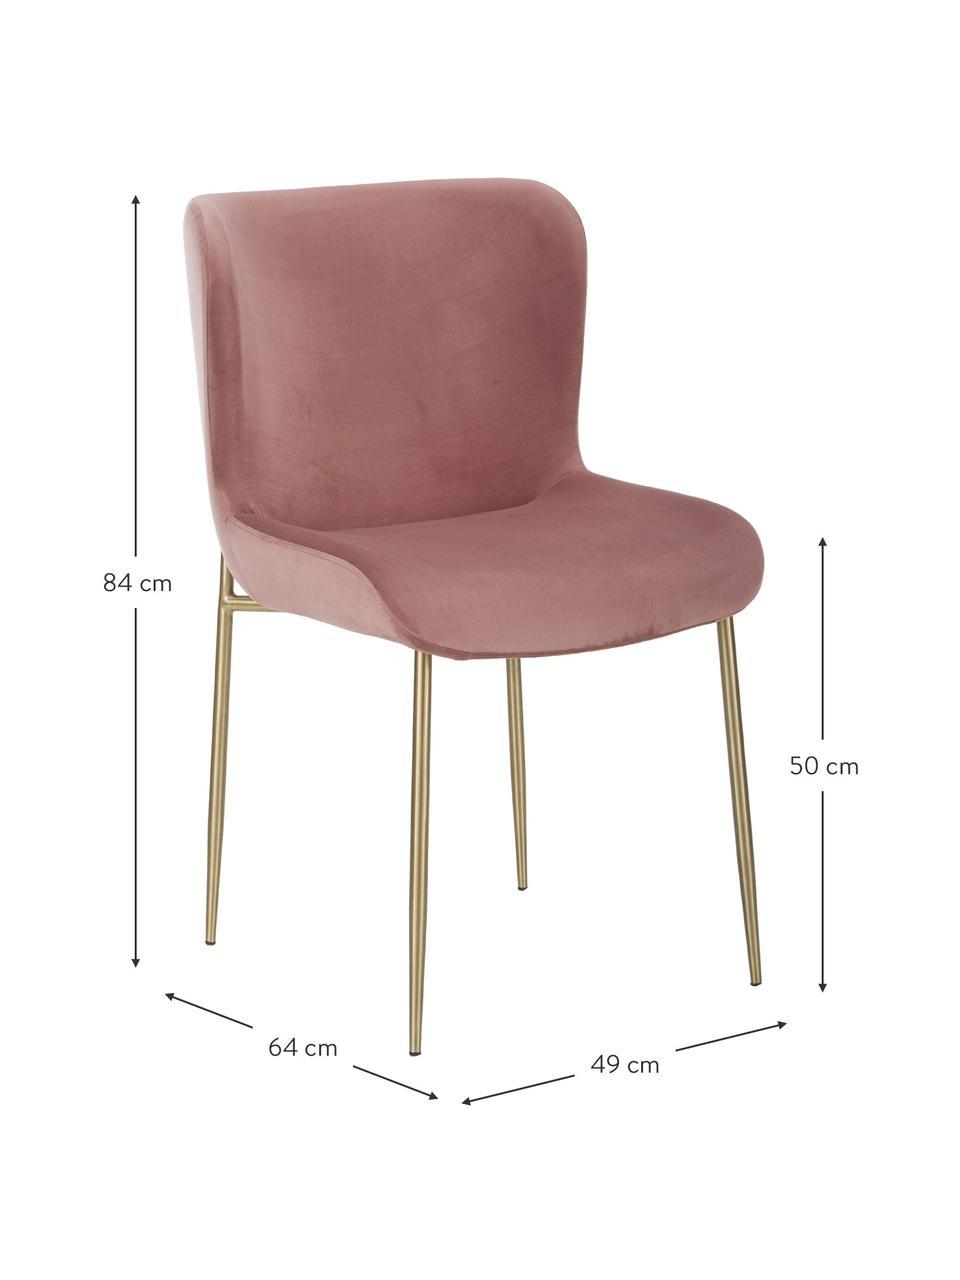 Samt-Polsterstuhl Tess in Altrosa, Bezug: Samt (Polyester) Der hoch, Beine: Metall, pulverbeschichtet, Samt Altrosa, Gold, B 49 x T 64 cm